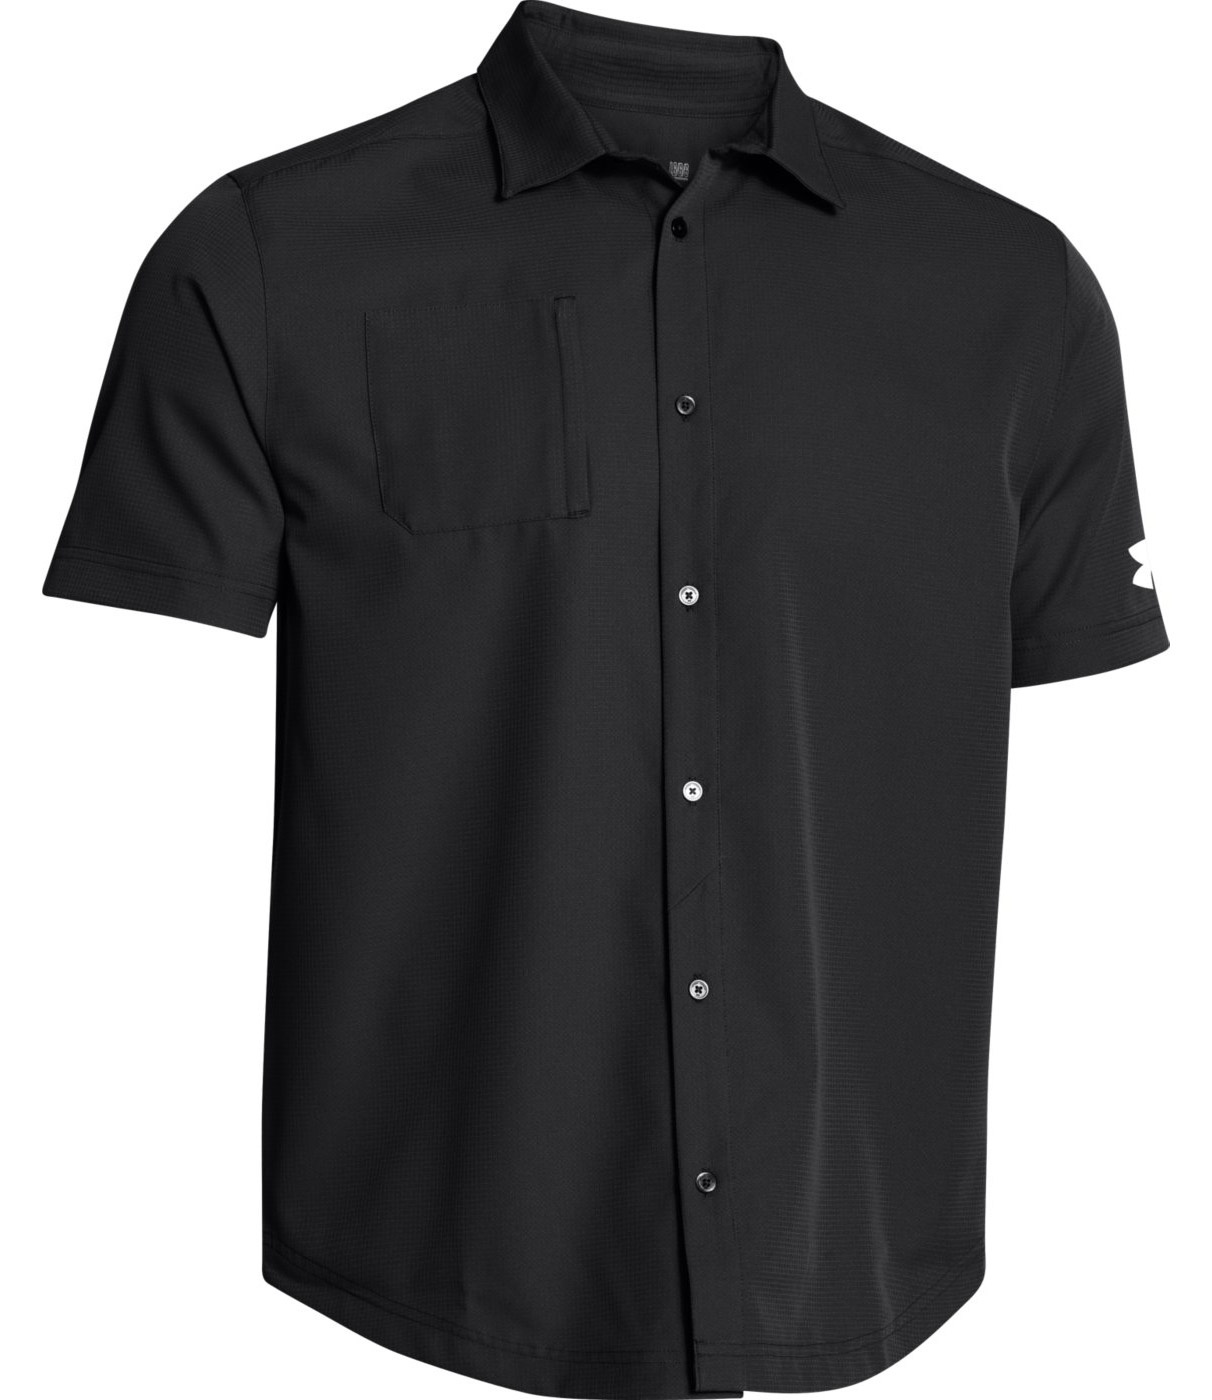 Under armour ultimate men 39 s button down short sleeve shirt for Under armour half sleeve shirt